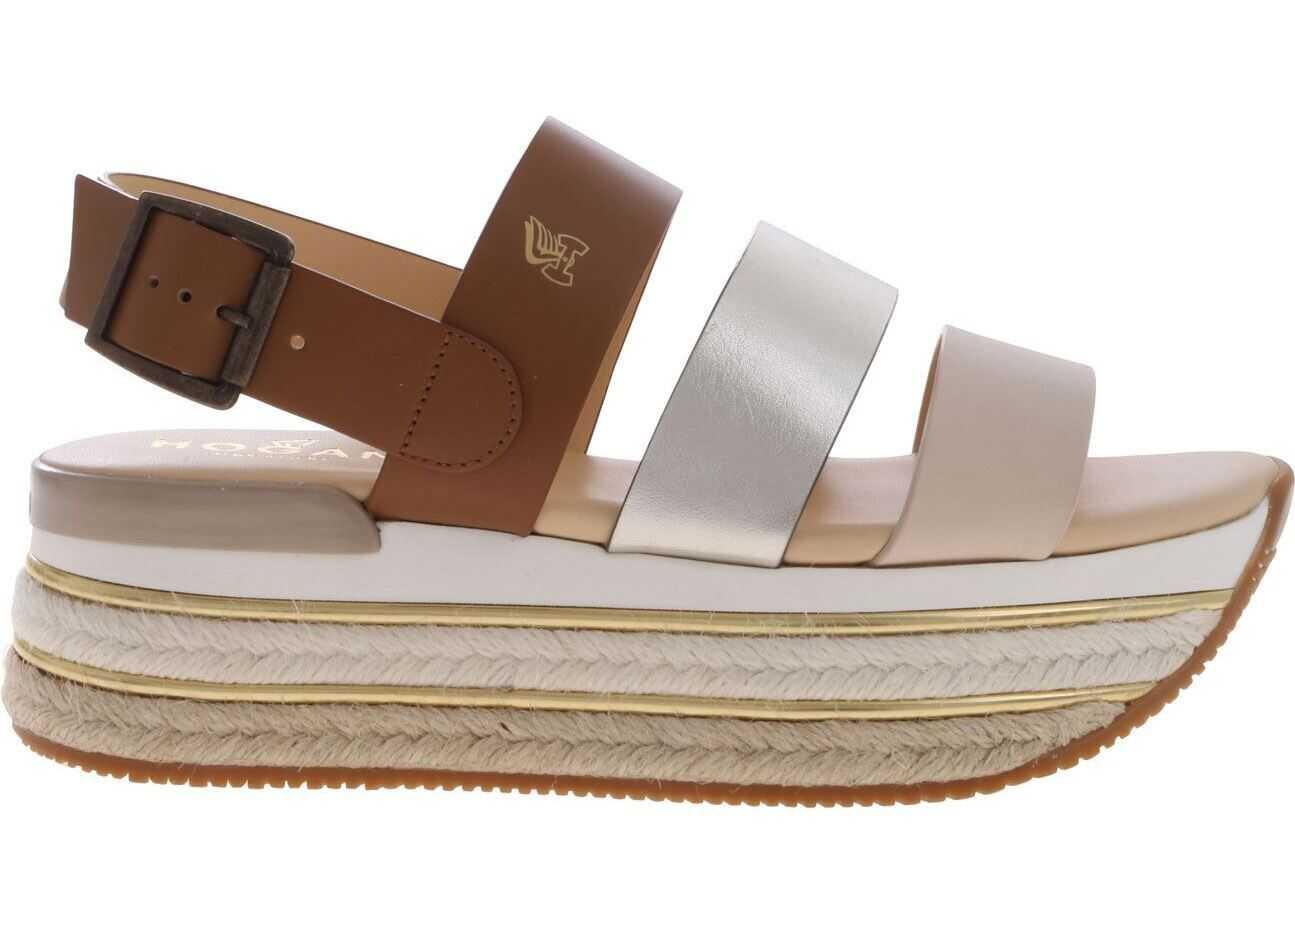 Hogan H432 Sandals In Contrasting Stripes Brown